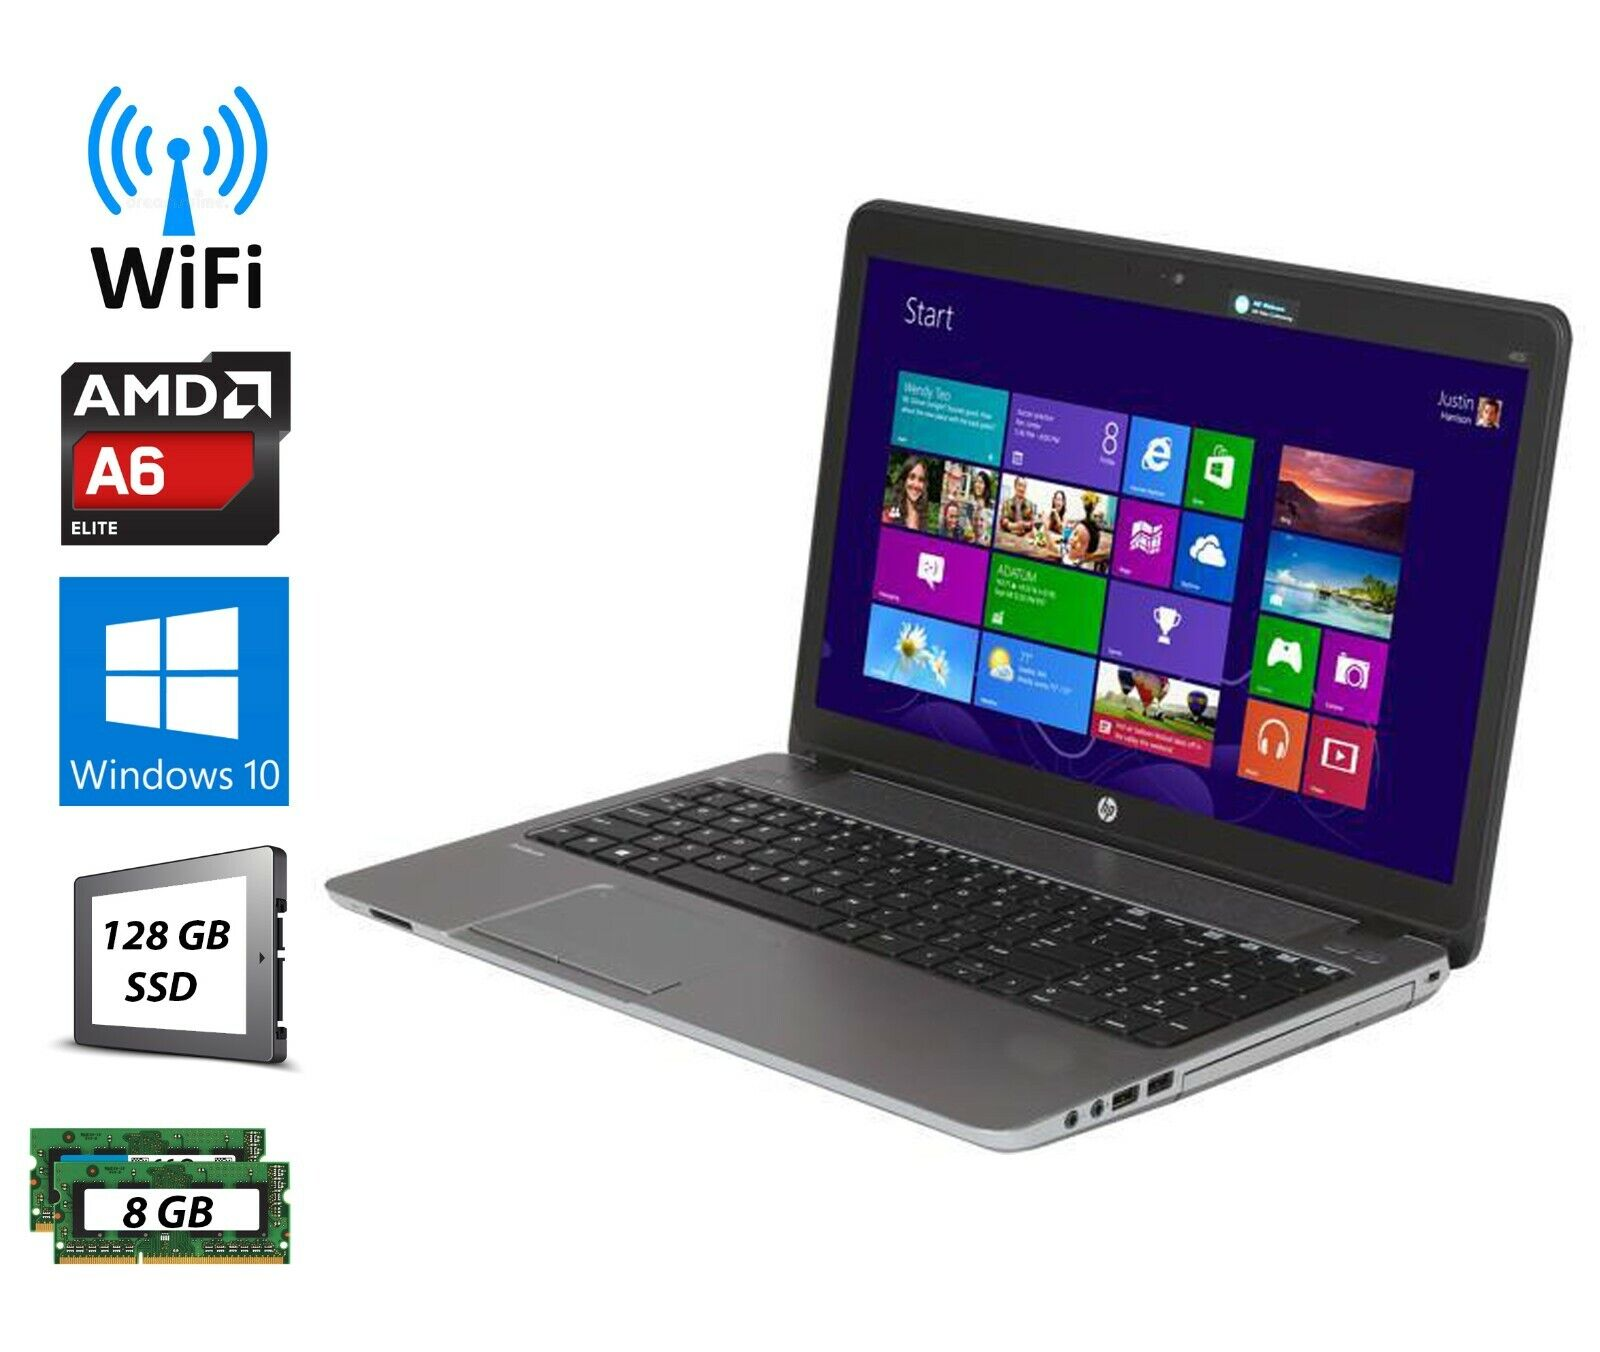 "Laptop Windows - HP ProBook 455 G1 15.6"" AMD A6 Laptop 8GB 128GB SSD Windows 10 Pro DVD Webcam"